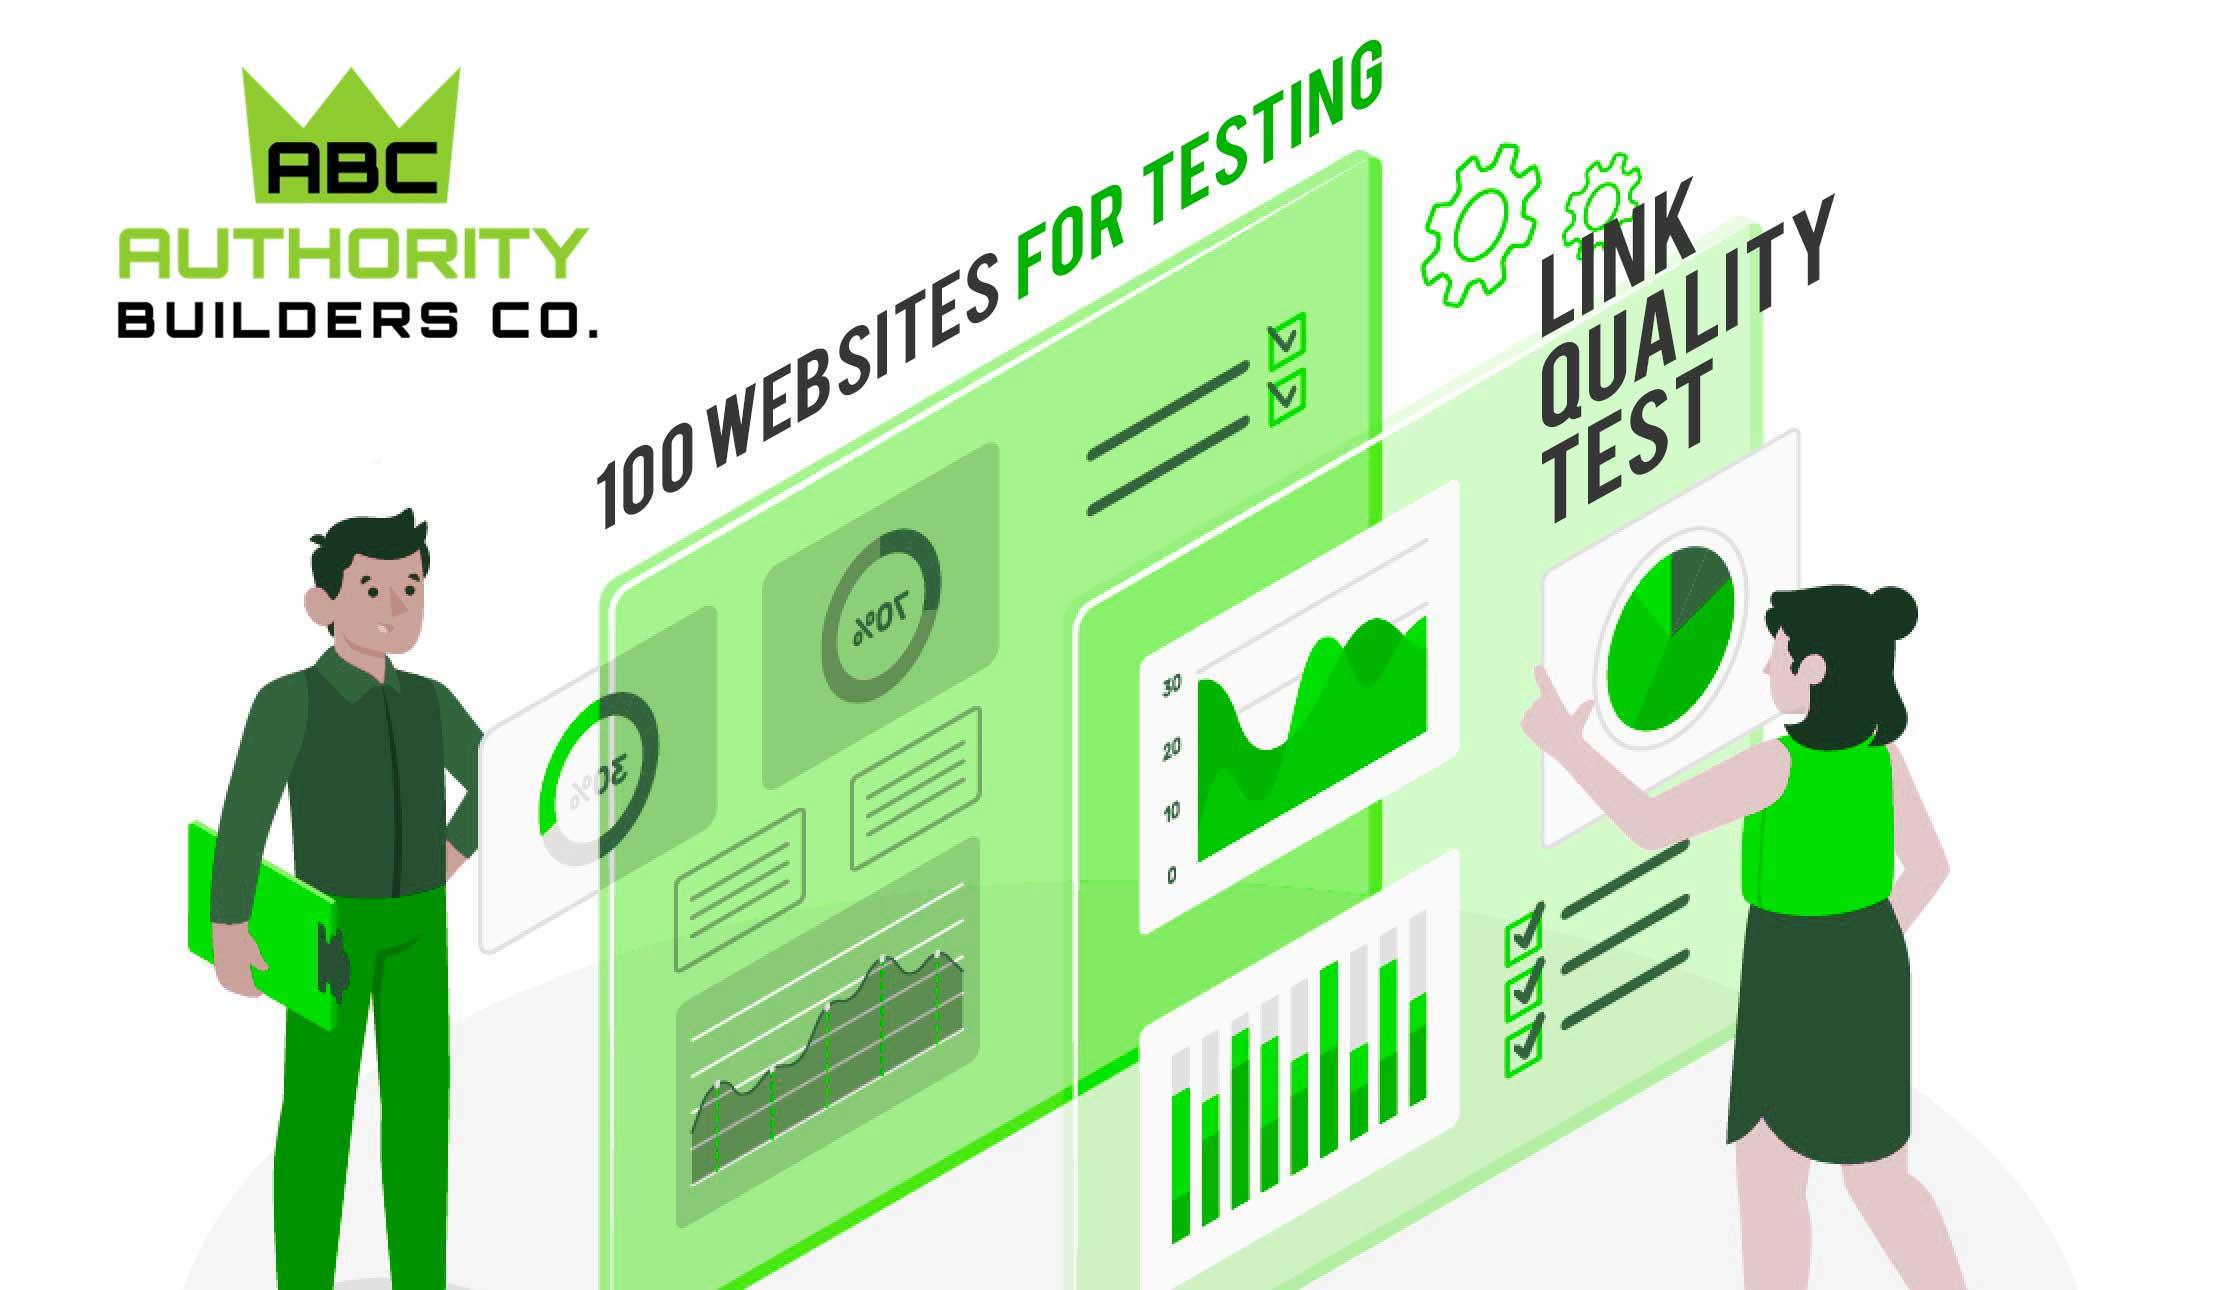 100-website-testing